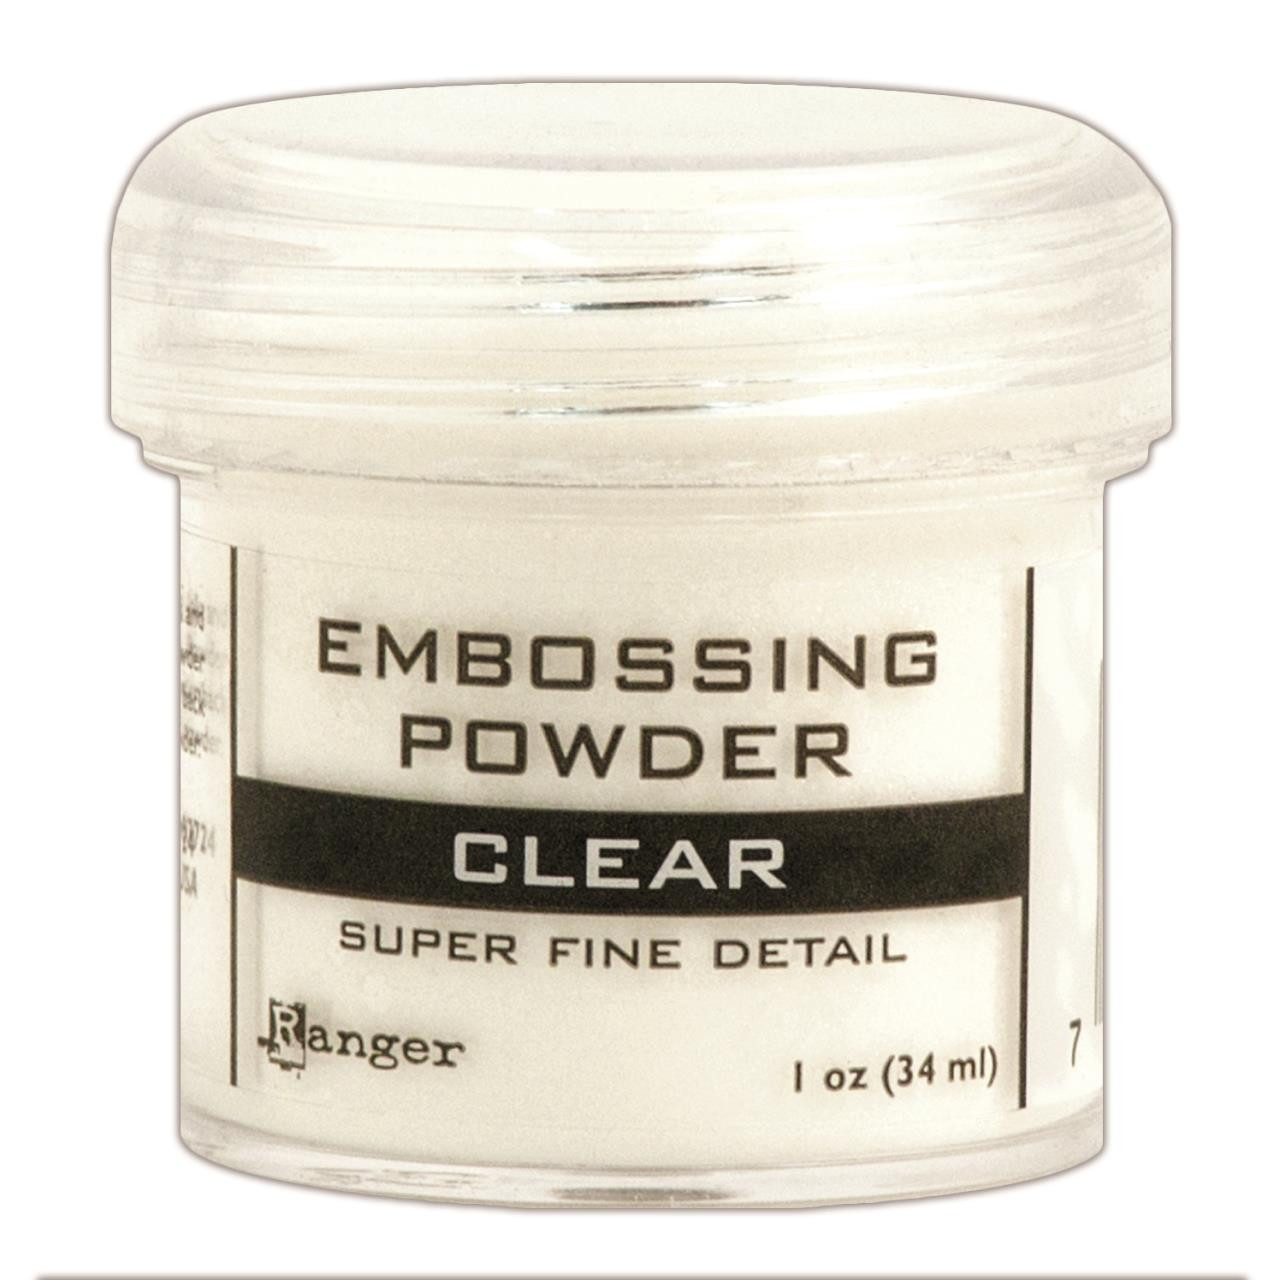 Ranger Super Fine Embossing Powder, Clear -